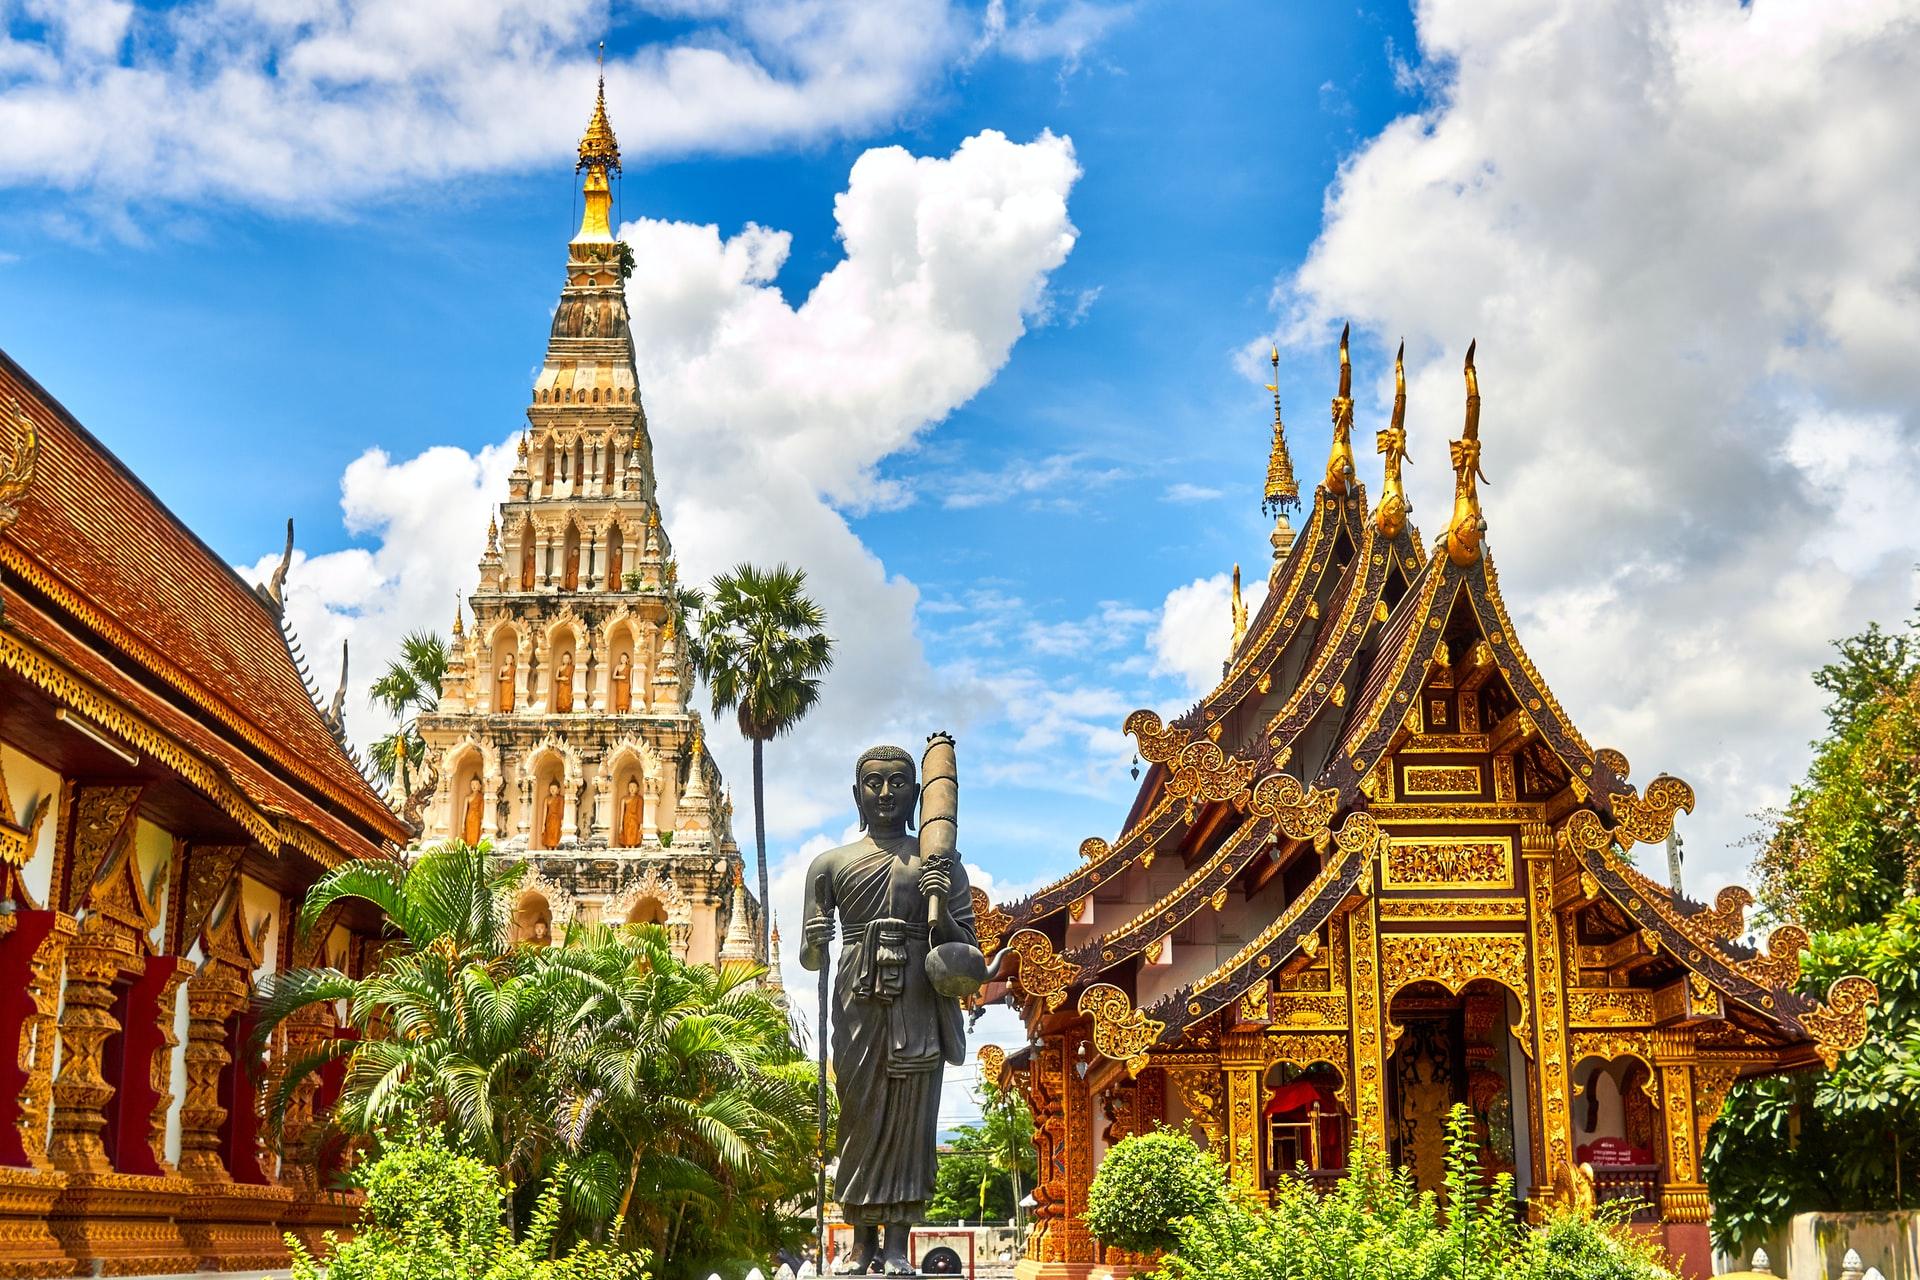 buildings in Thailand